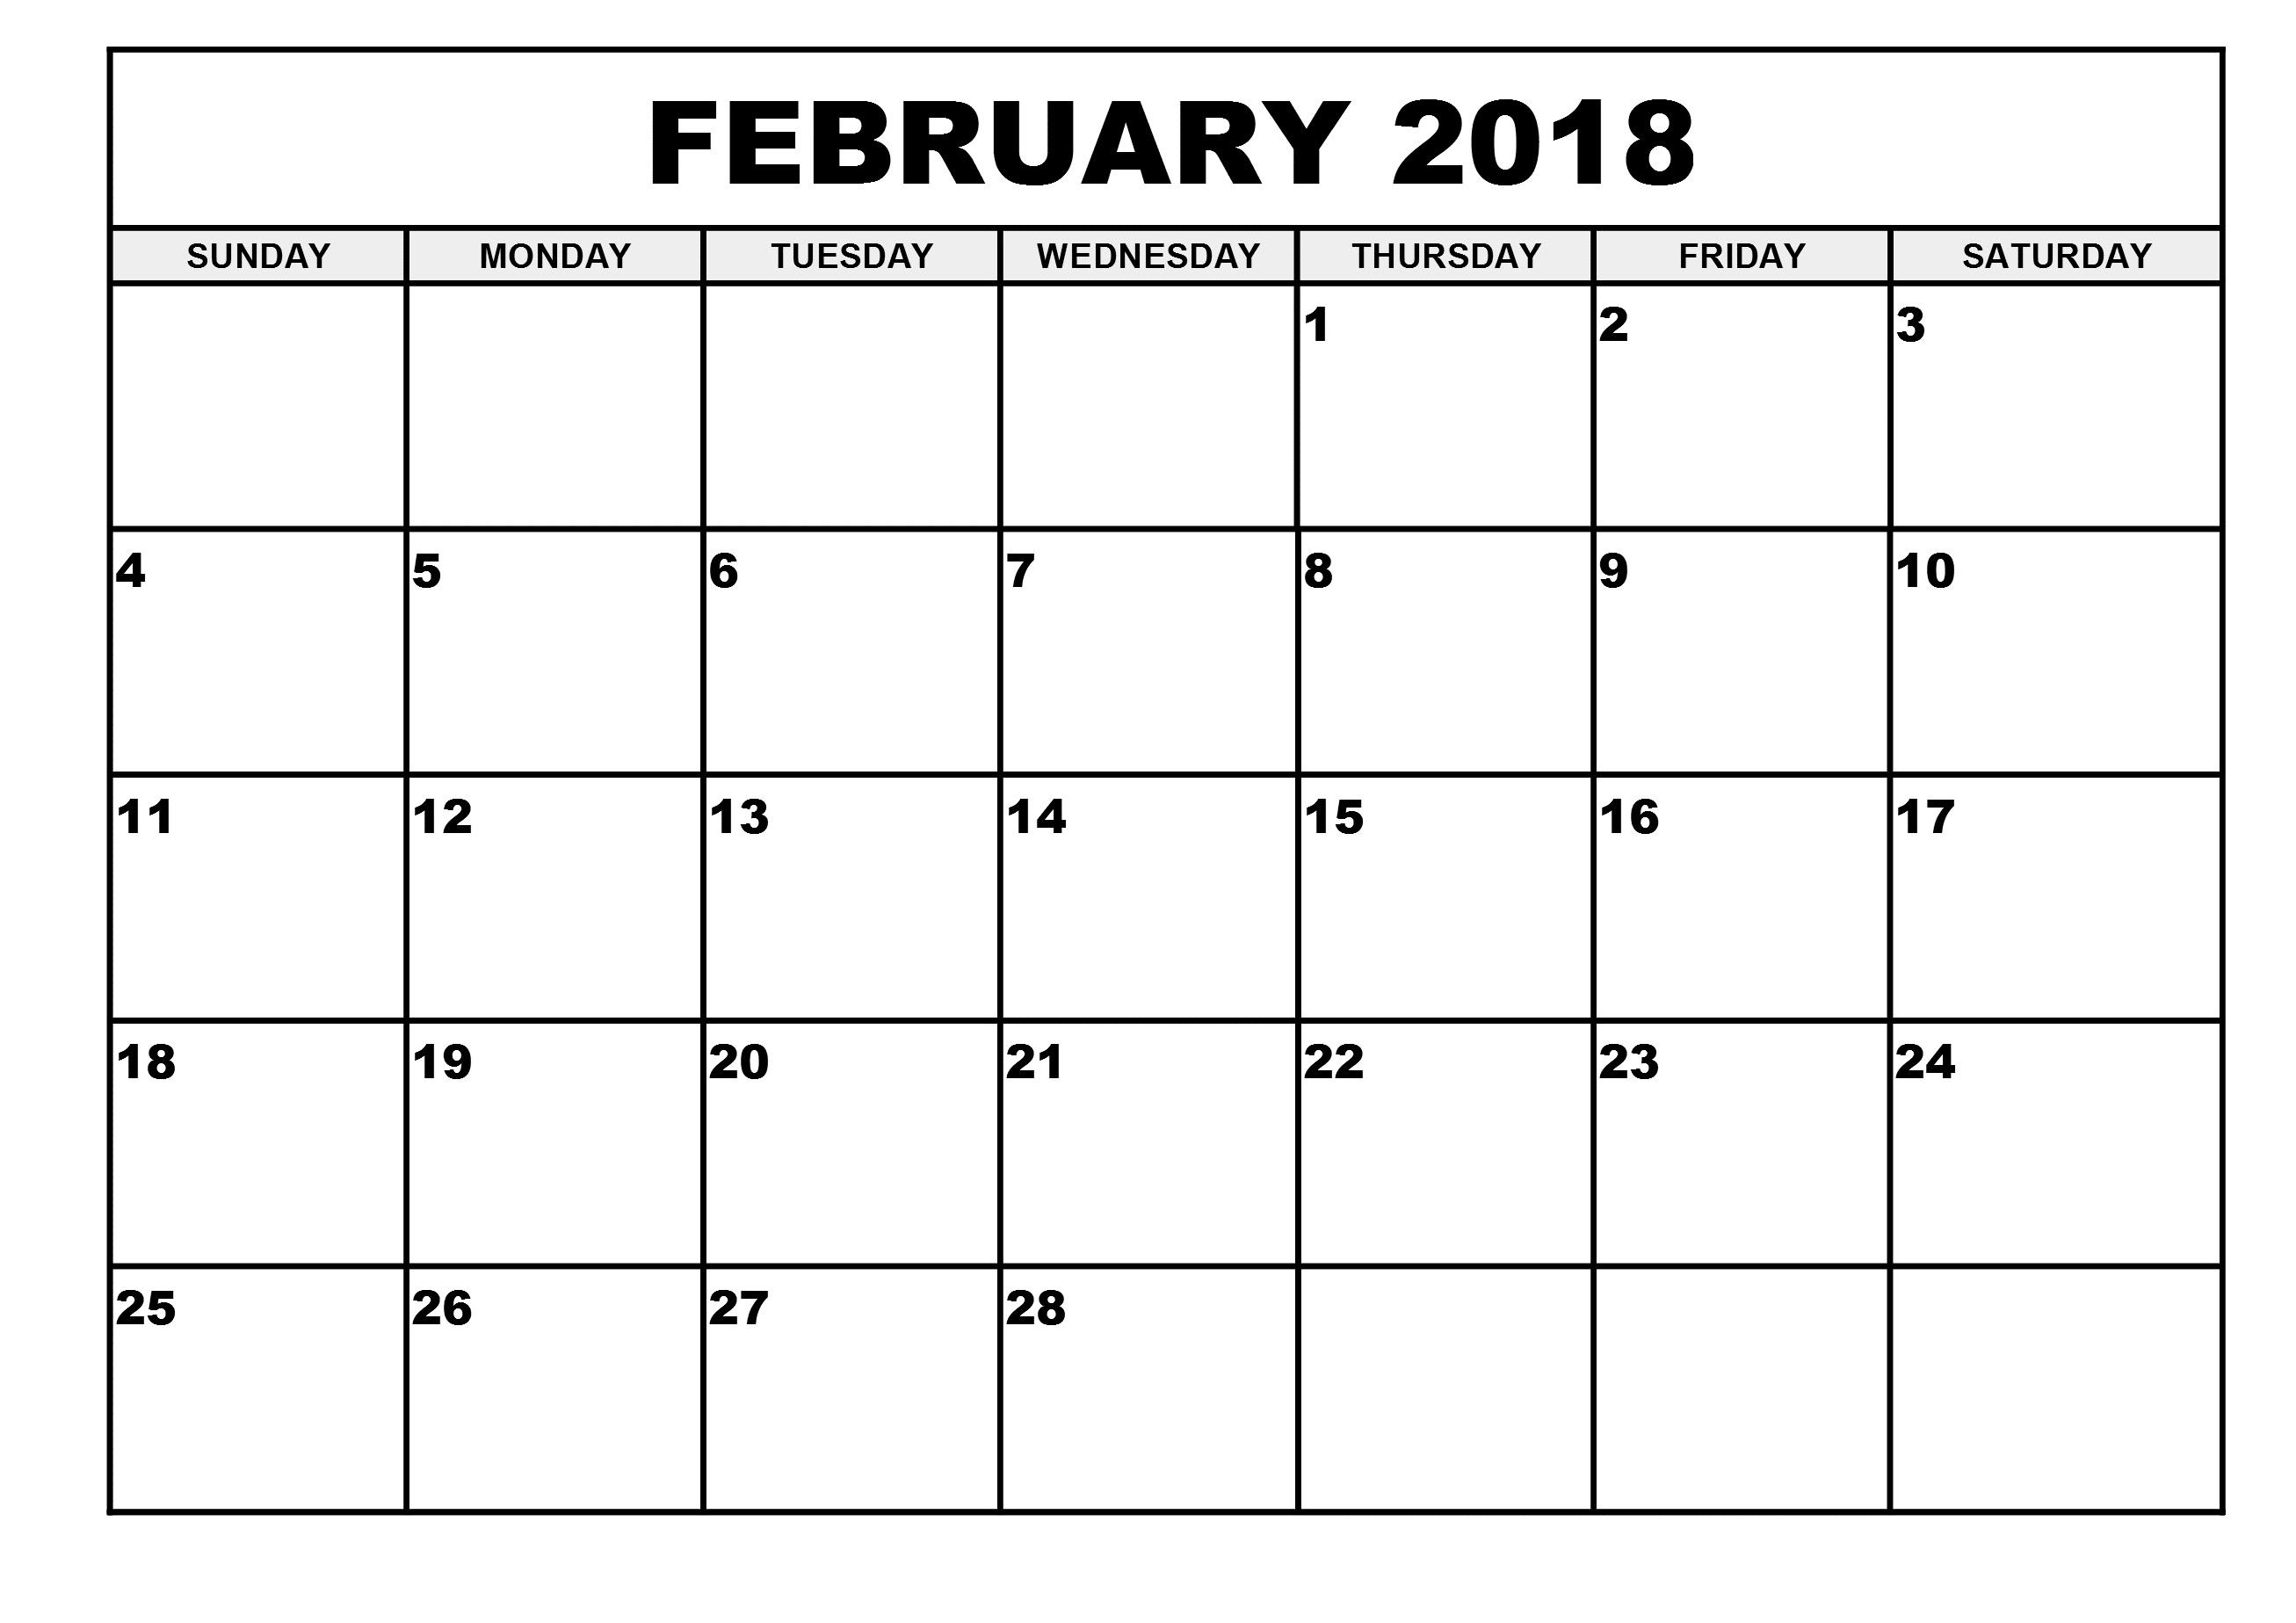 February 2018 Blank Printable Calendar | February 2019 Calendar